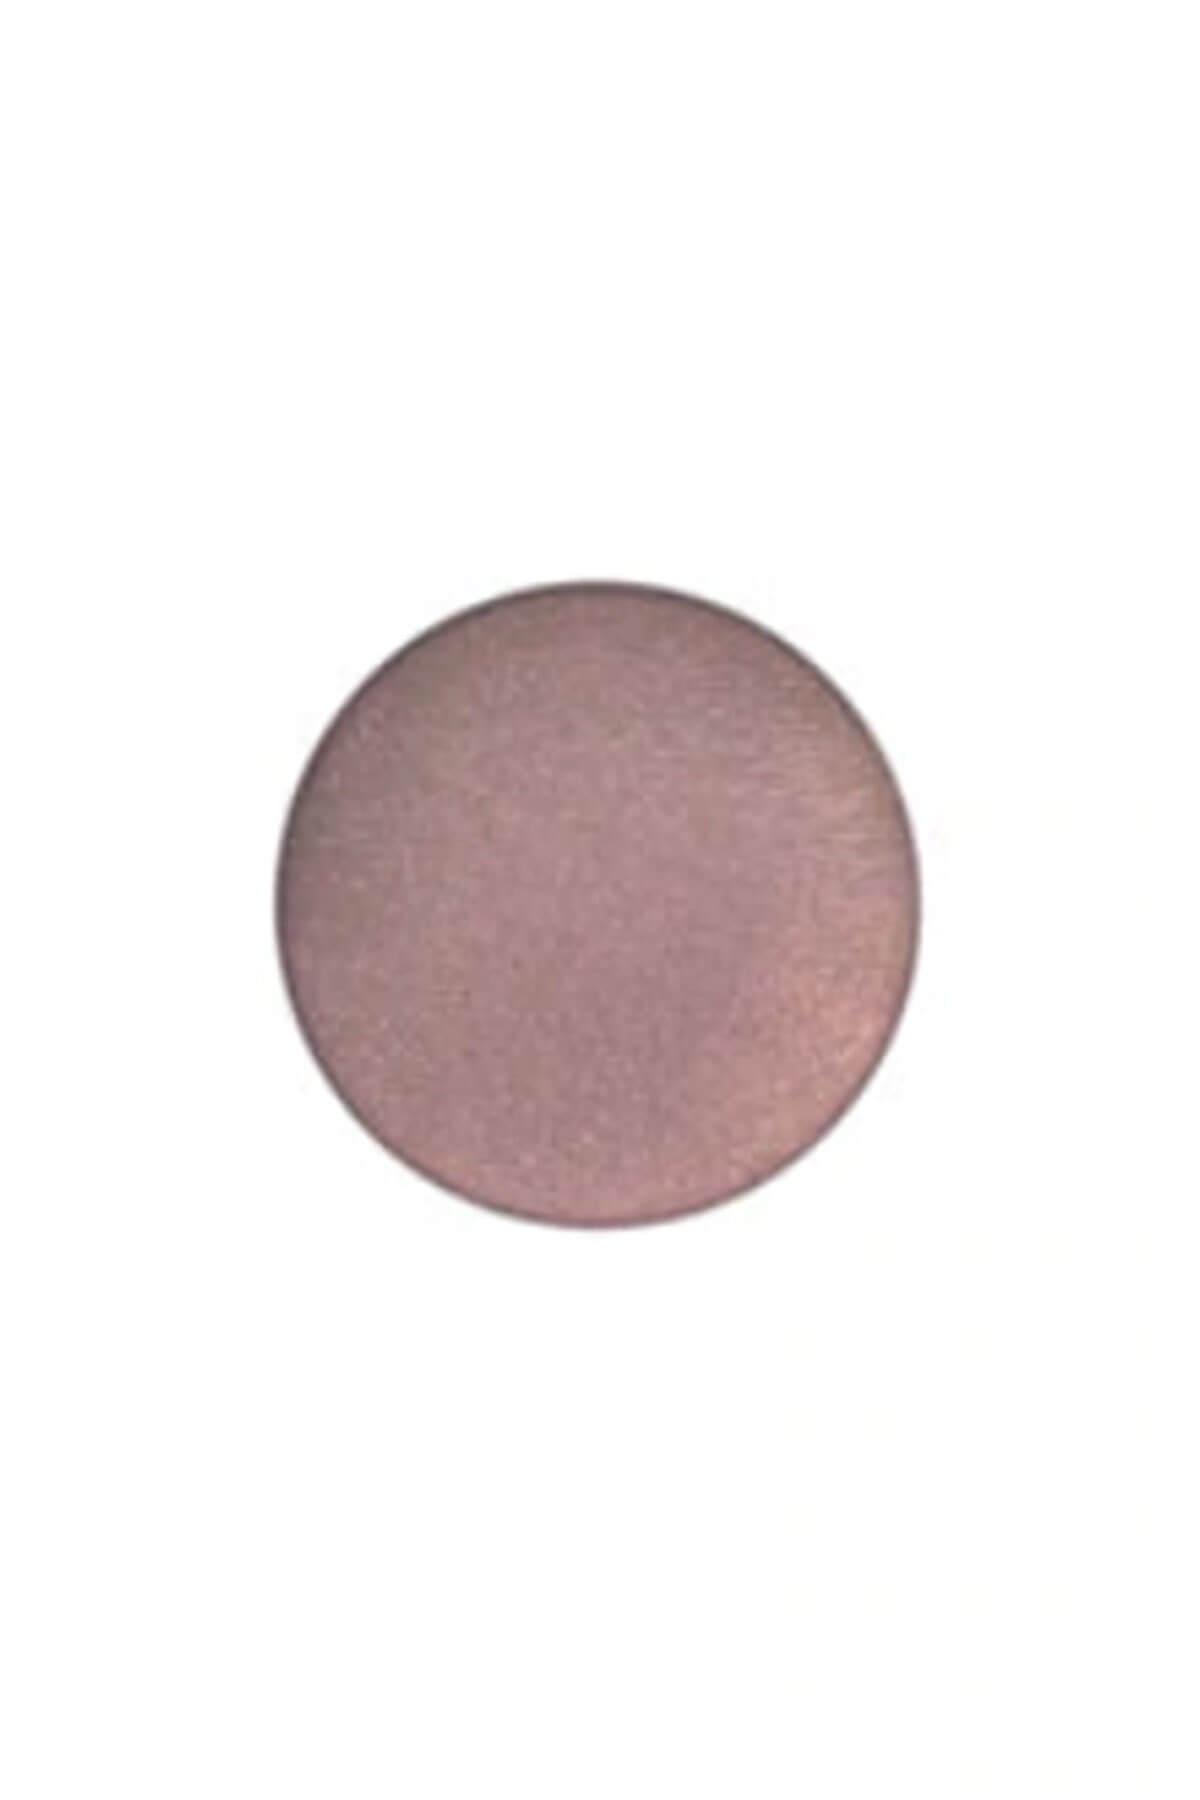 M.A.C Göz Farı - Refill Far Satin Taupe 1.5 g 773602965977 1